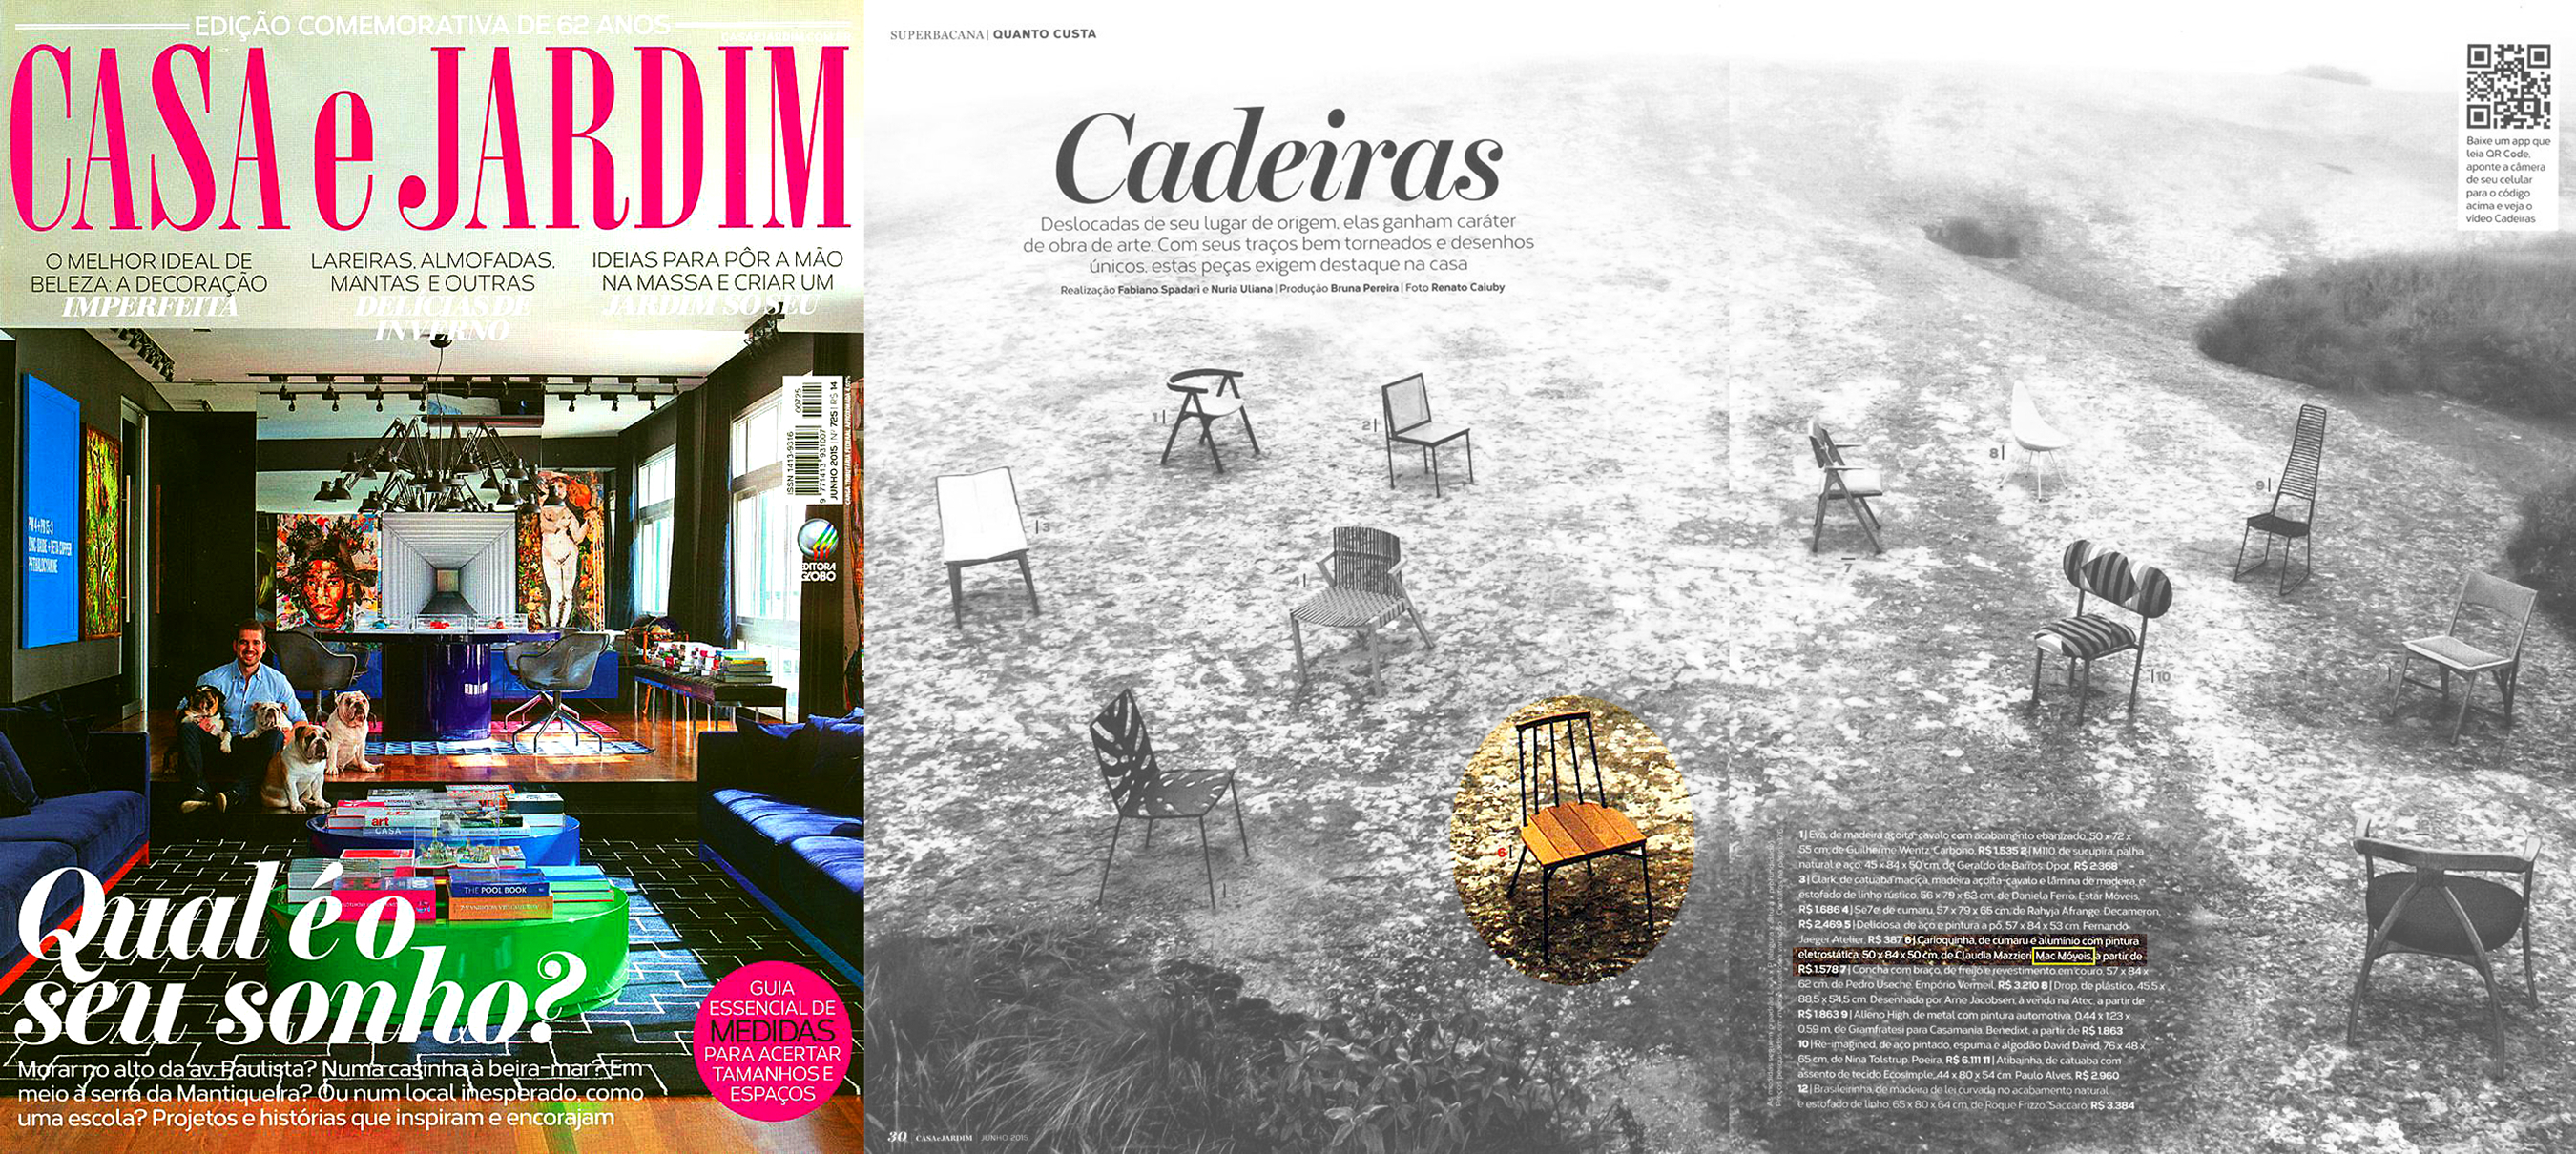 Casa e Jardim nº 725 - June 2015